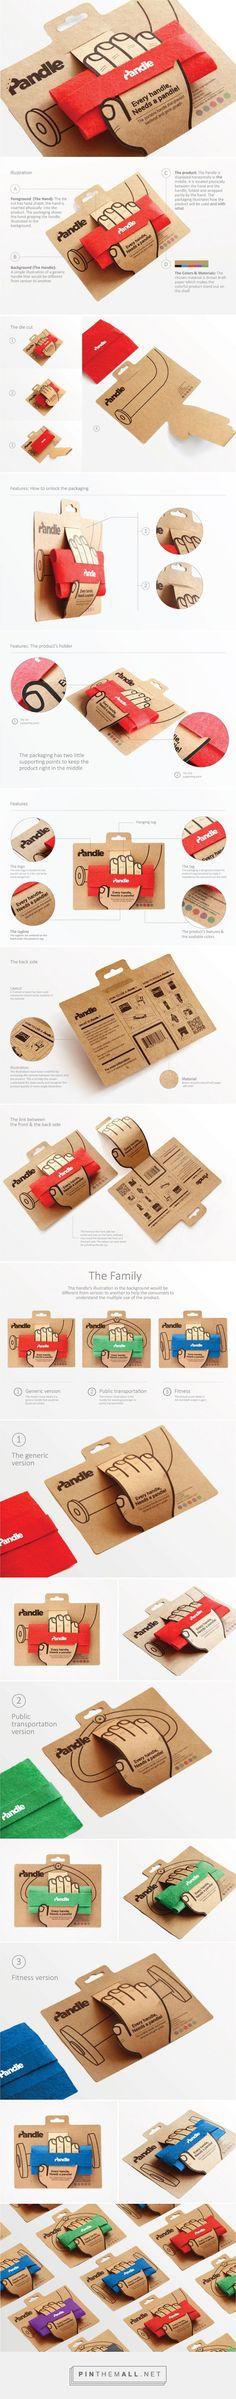 Pandle grip packaging designed by Hani Douaji - http://www.packagingoftheworld.com/2015/11/pandle-repackaging.html